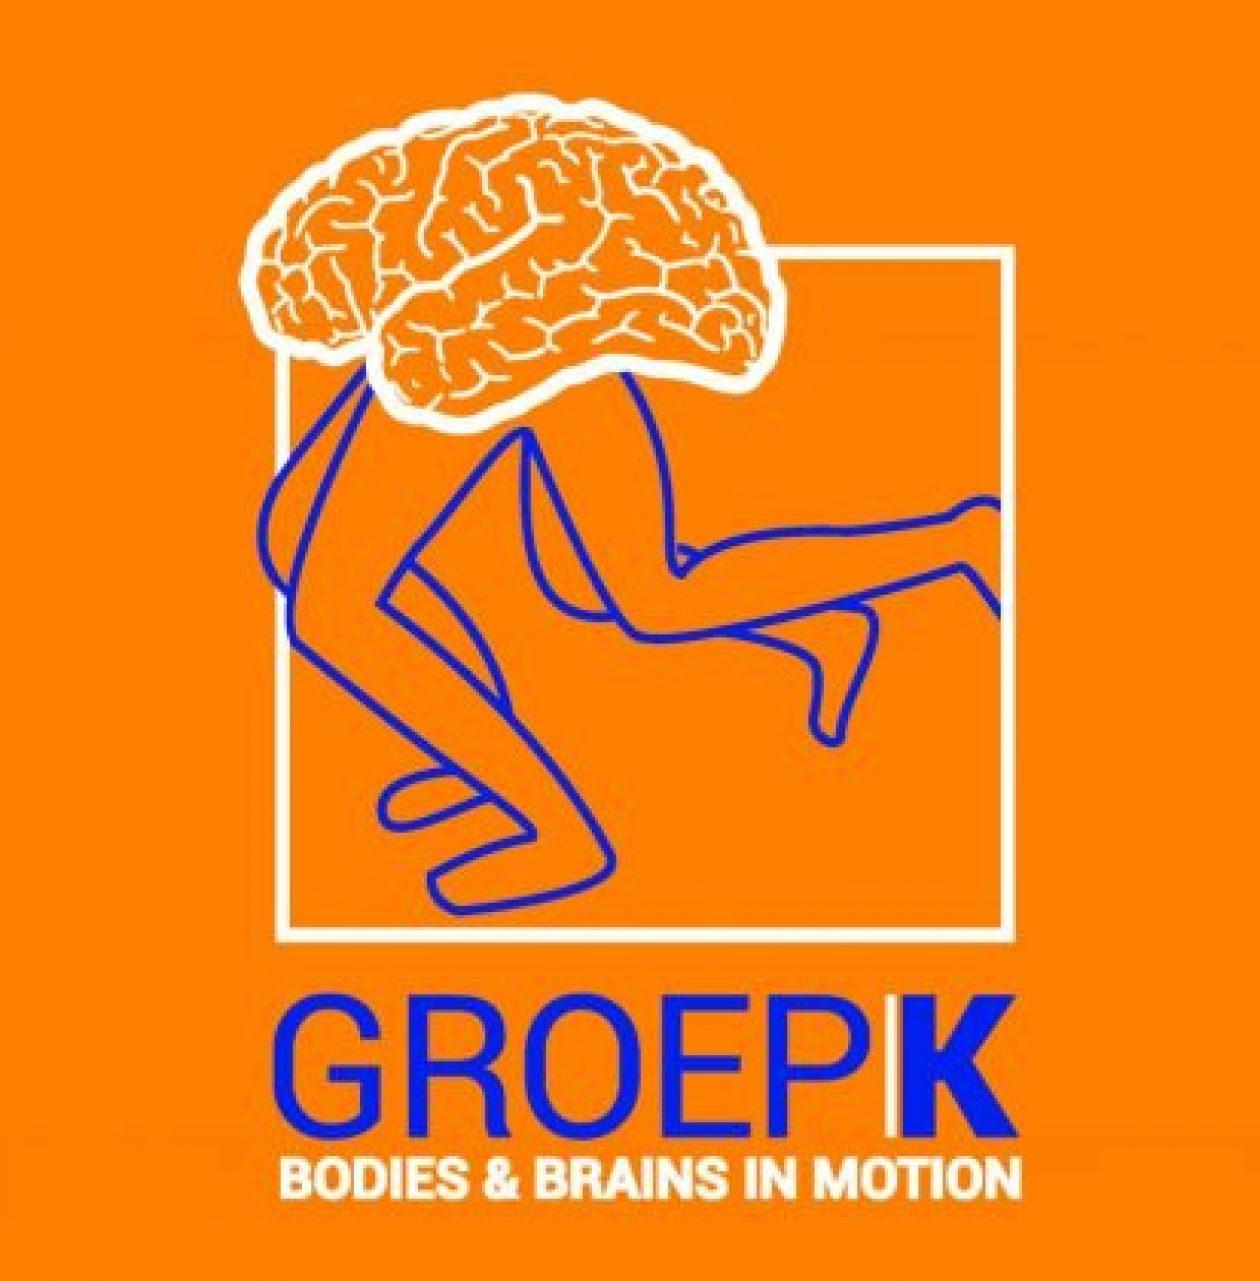 Groep K